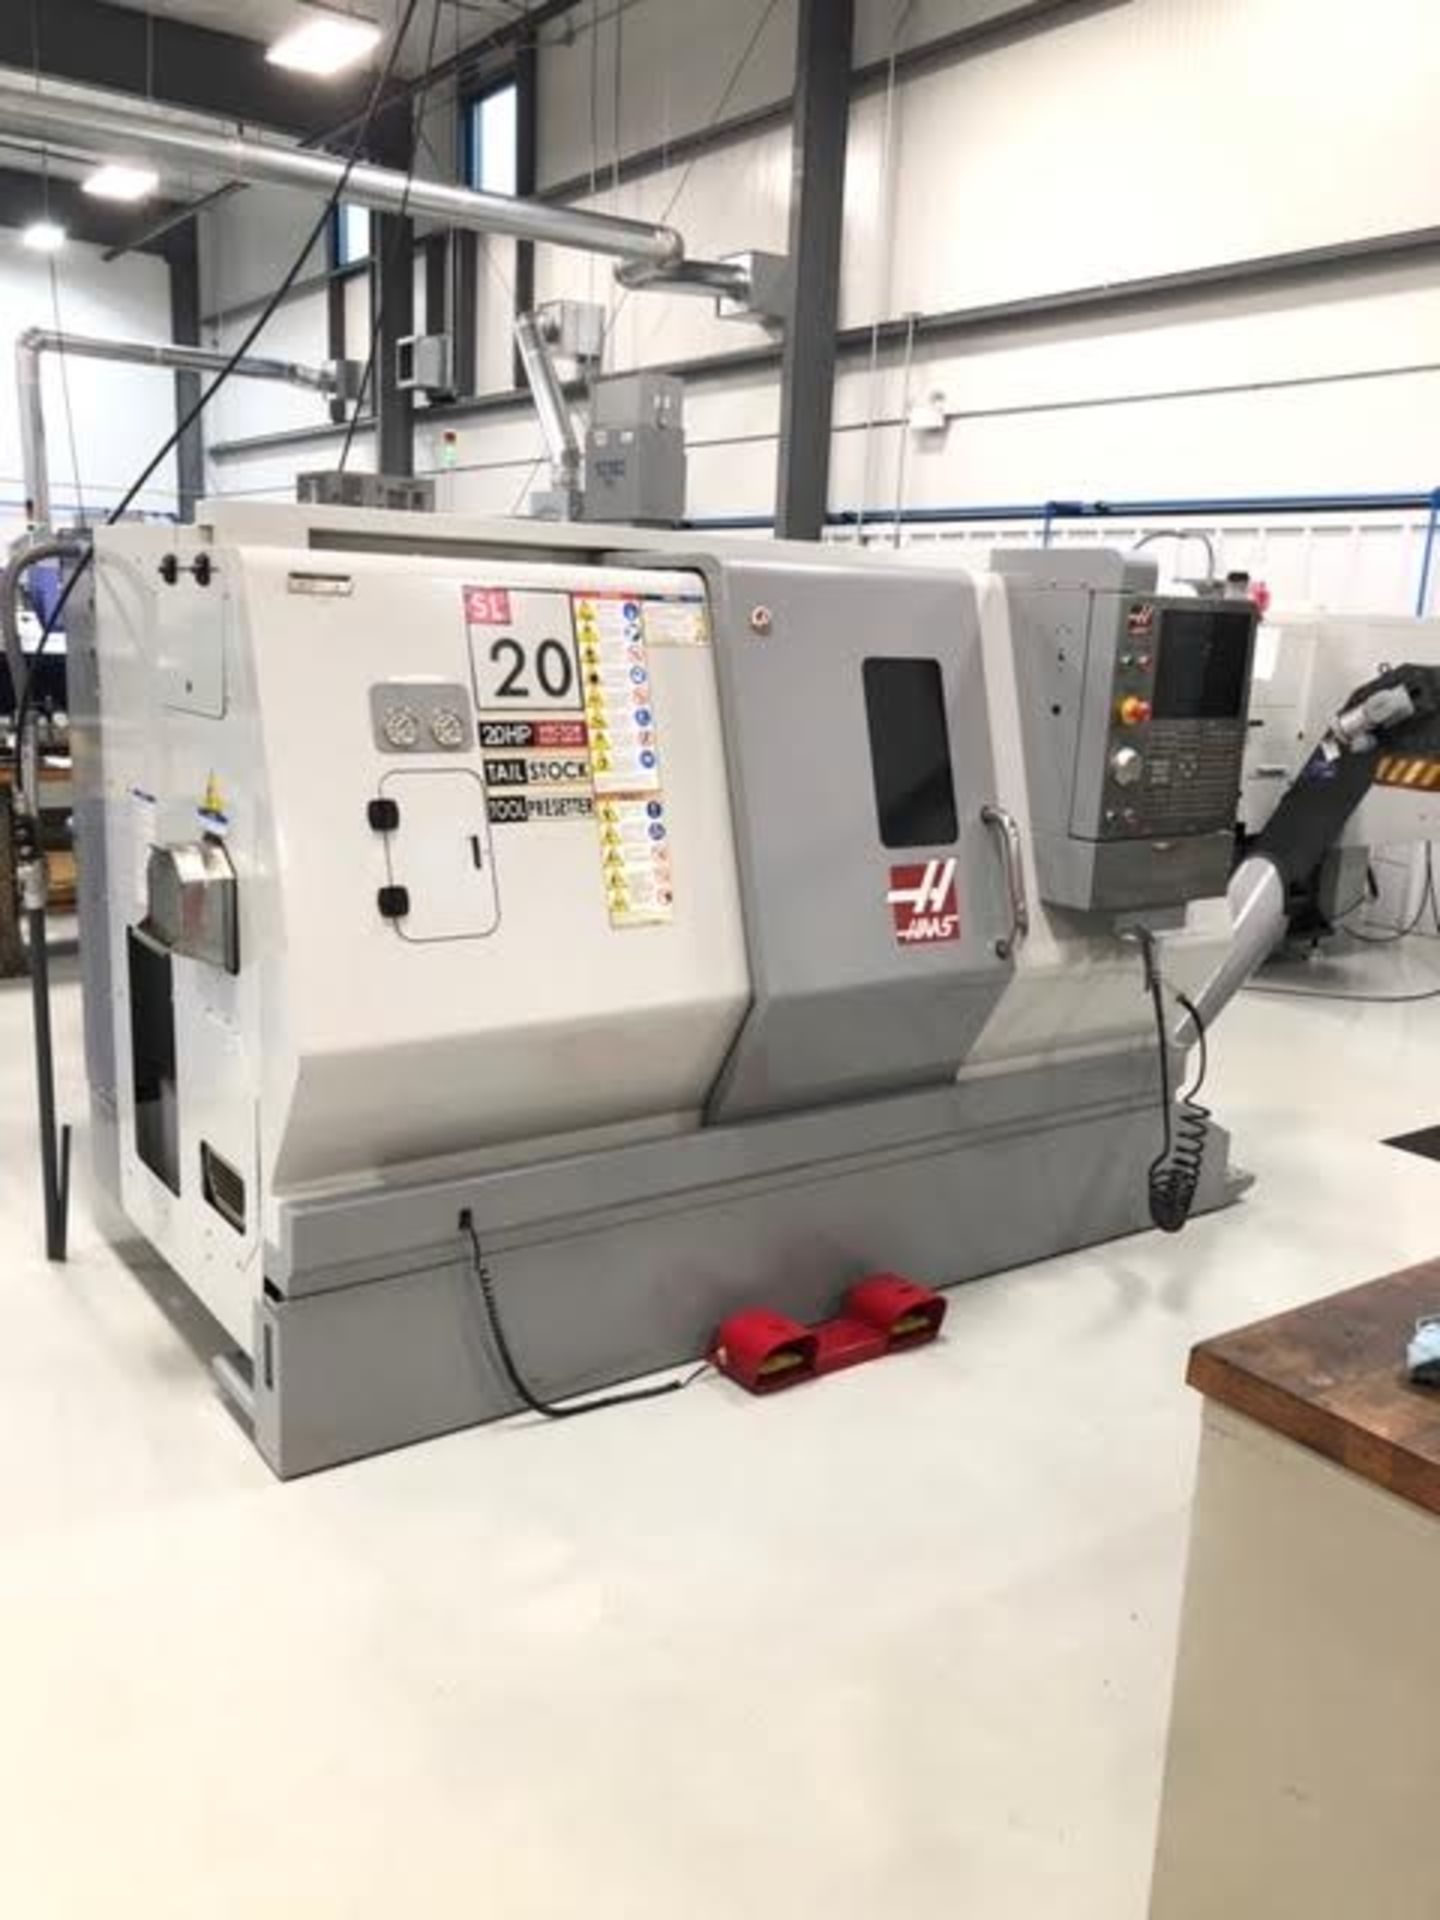 2009 Haas SL-20T CNC Lathe